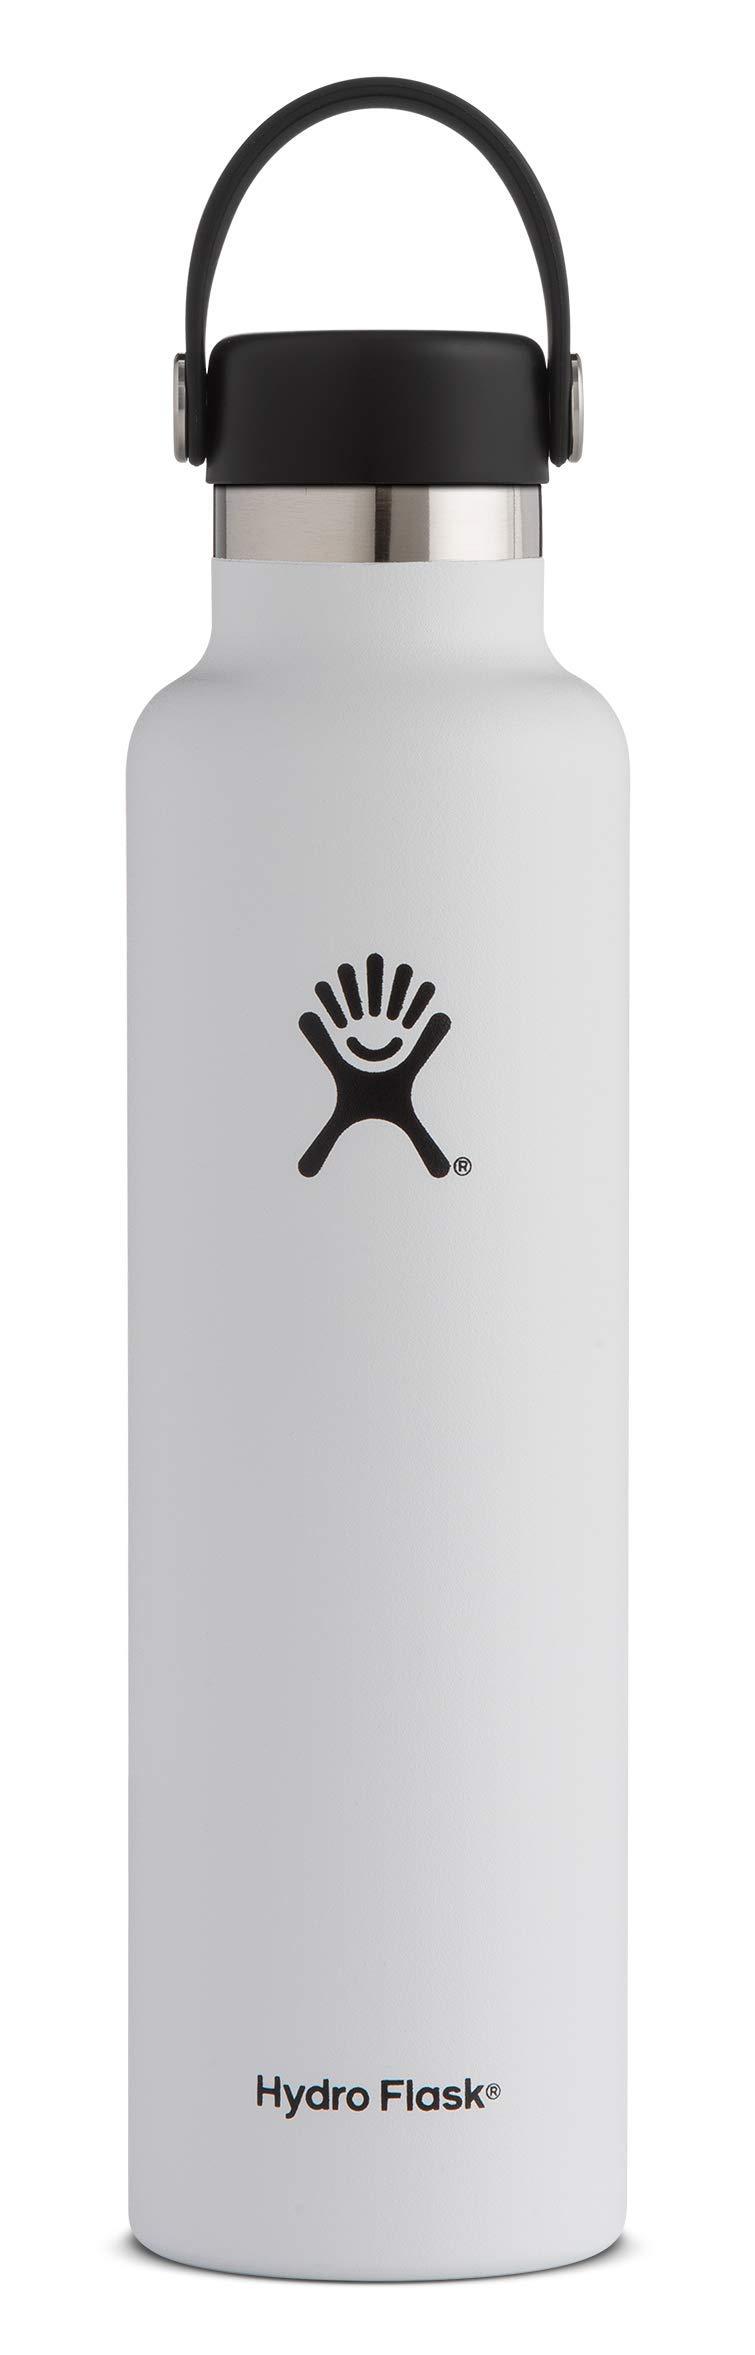 Hydro Flask FBA_S24SX110 Mouth 24 oz. Standard Water Bottle 710 ml, White